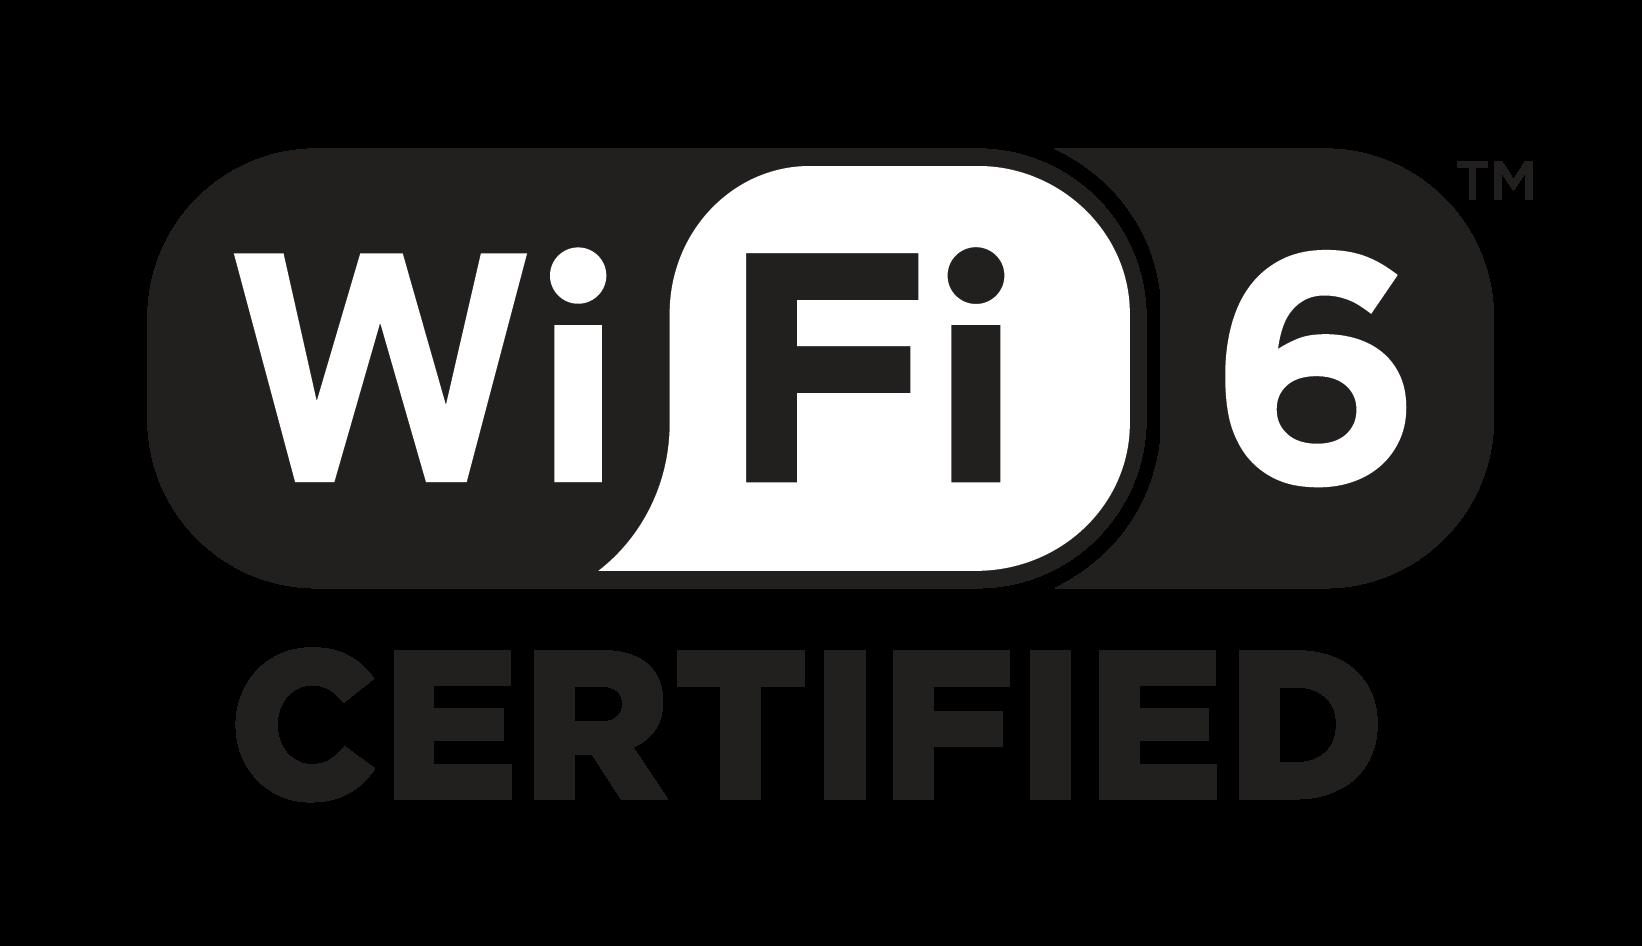 Wi-Fi Alliance Wi-Fi 6 Certified